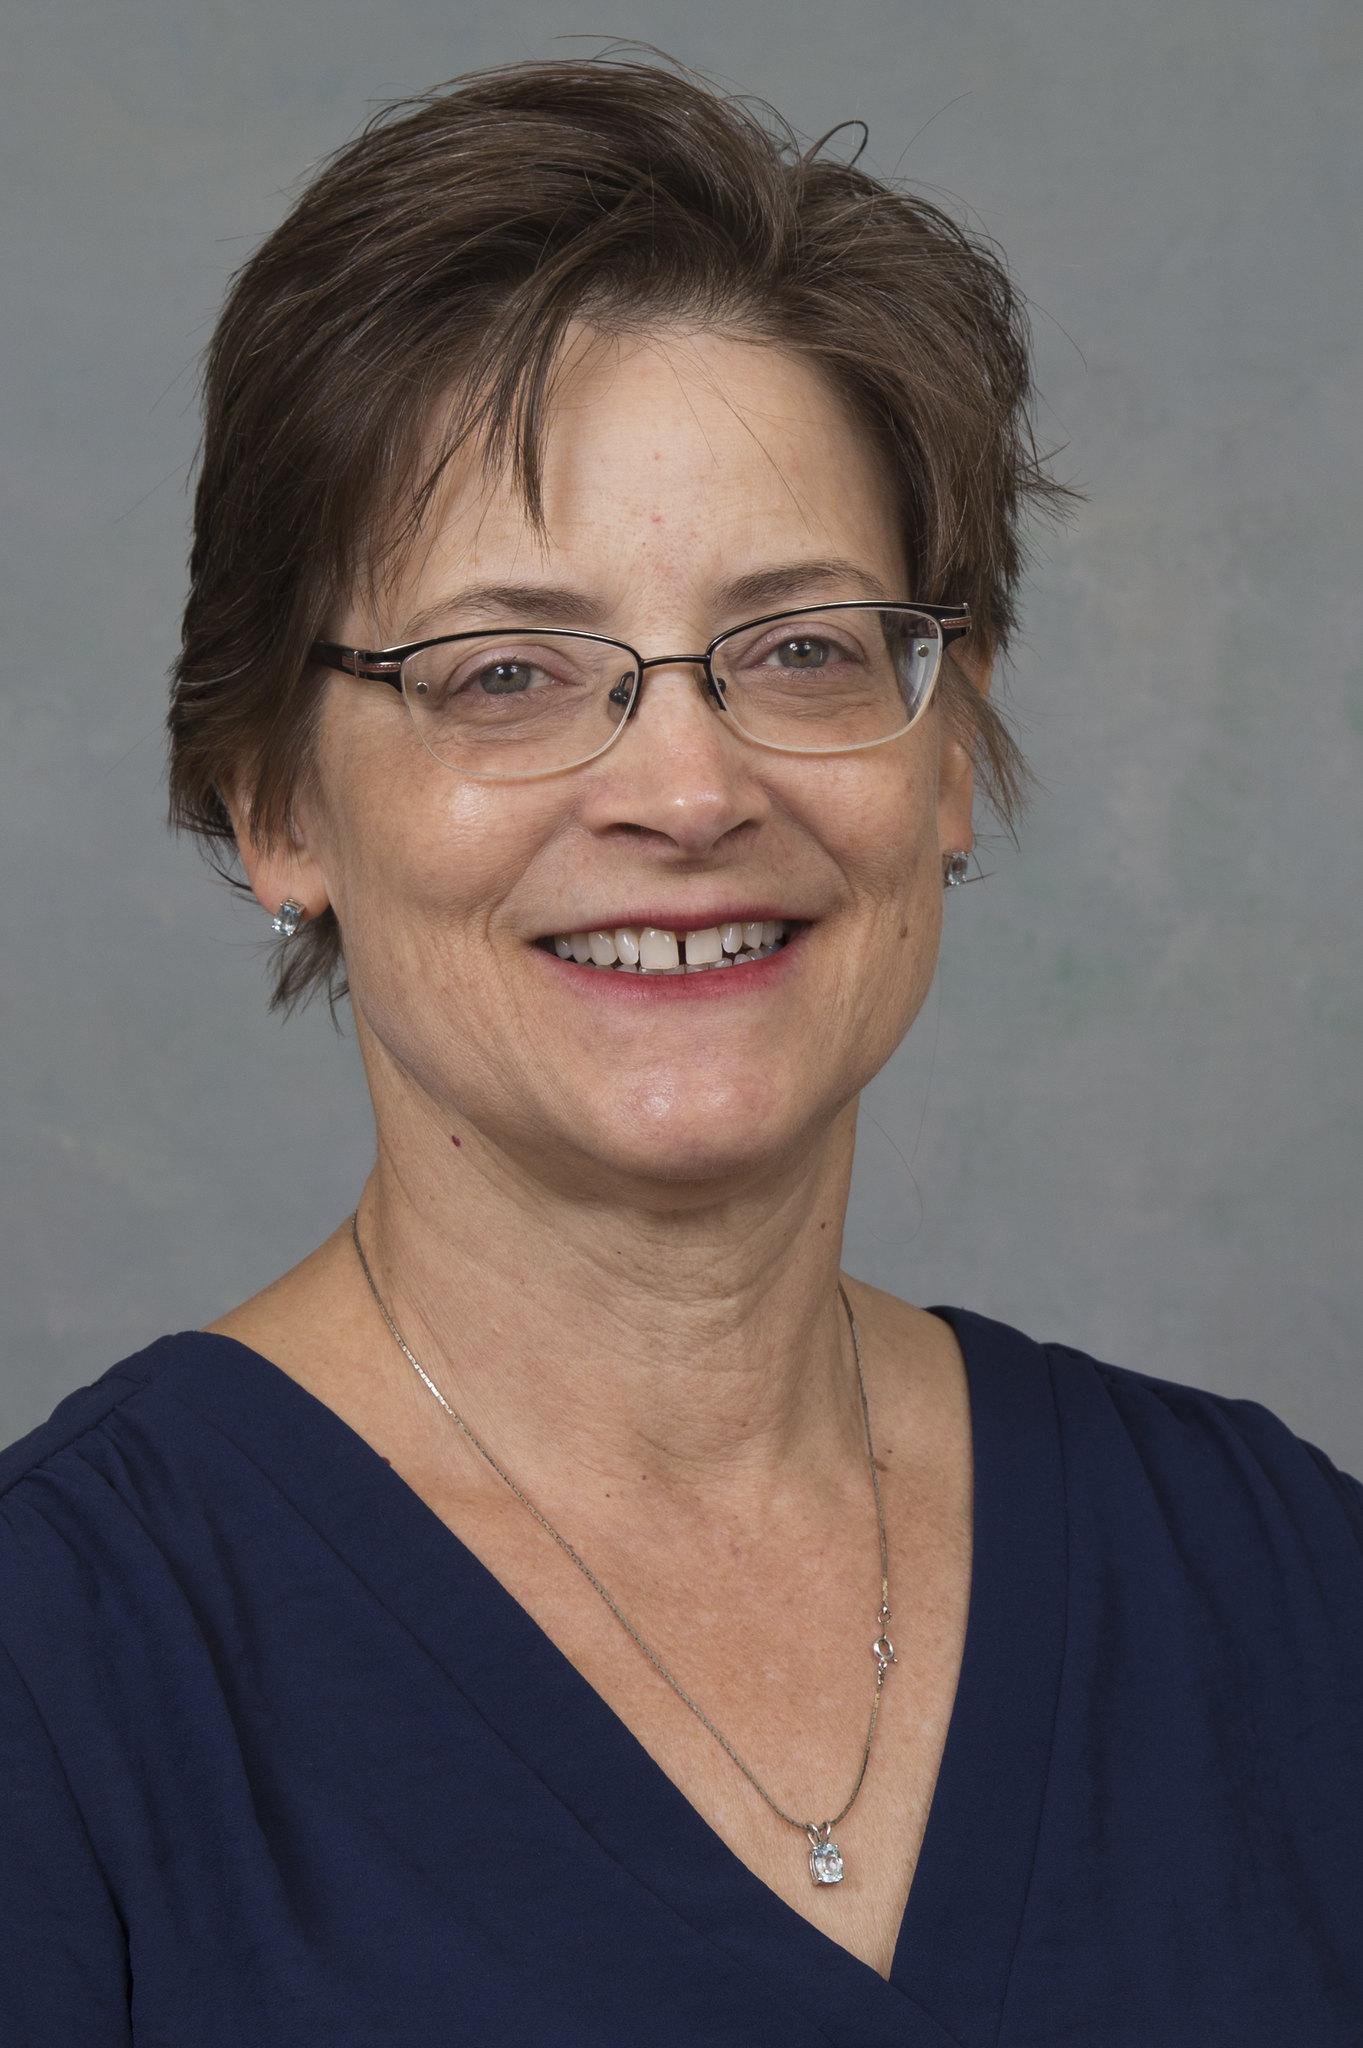 Karole Erikson